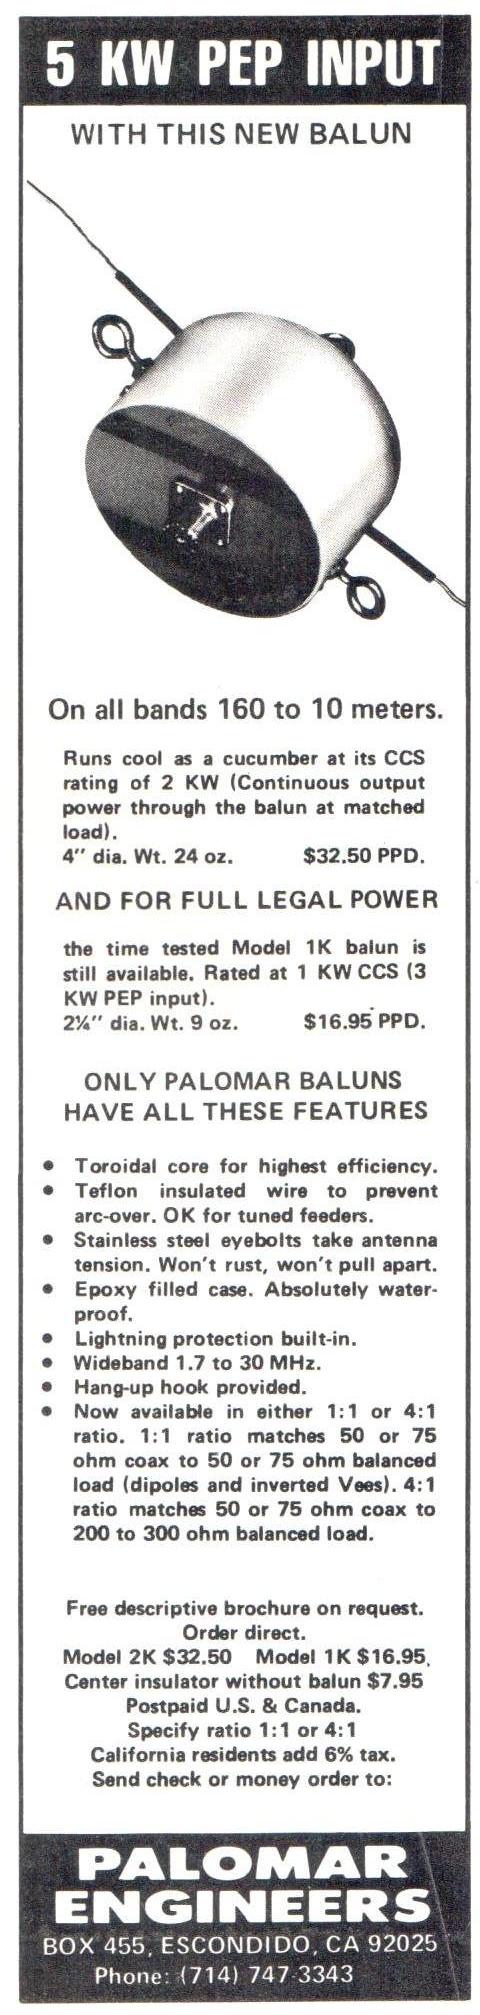 1K and 2K Balun Ad CQ 1977 Cropped - 1K, 2K Baluns